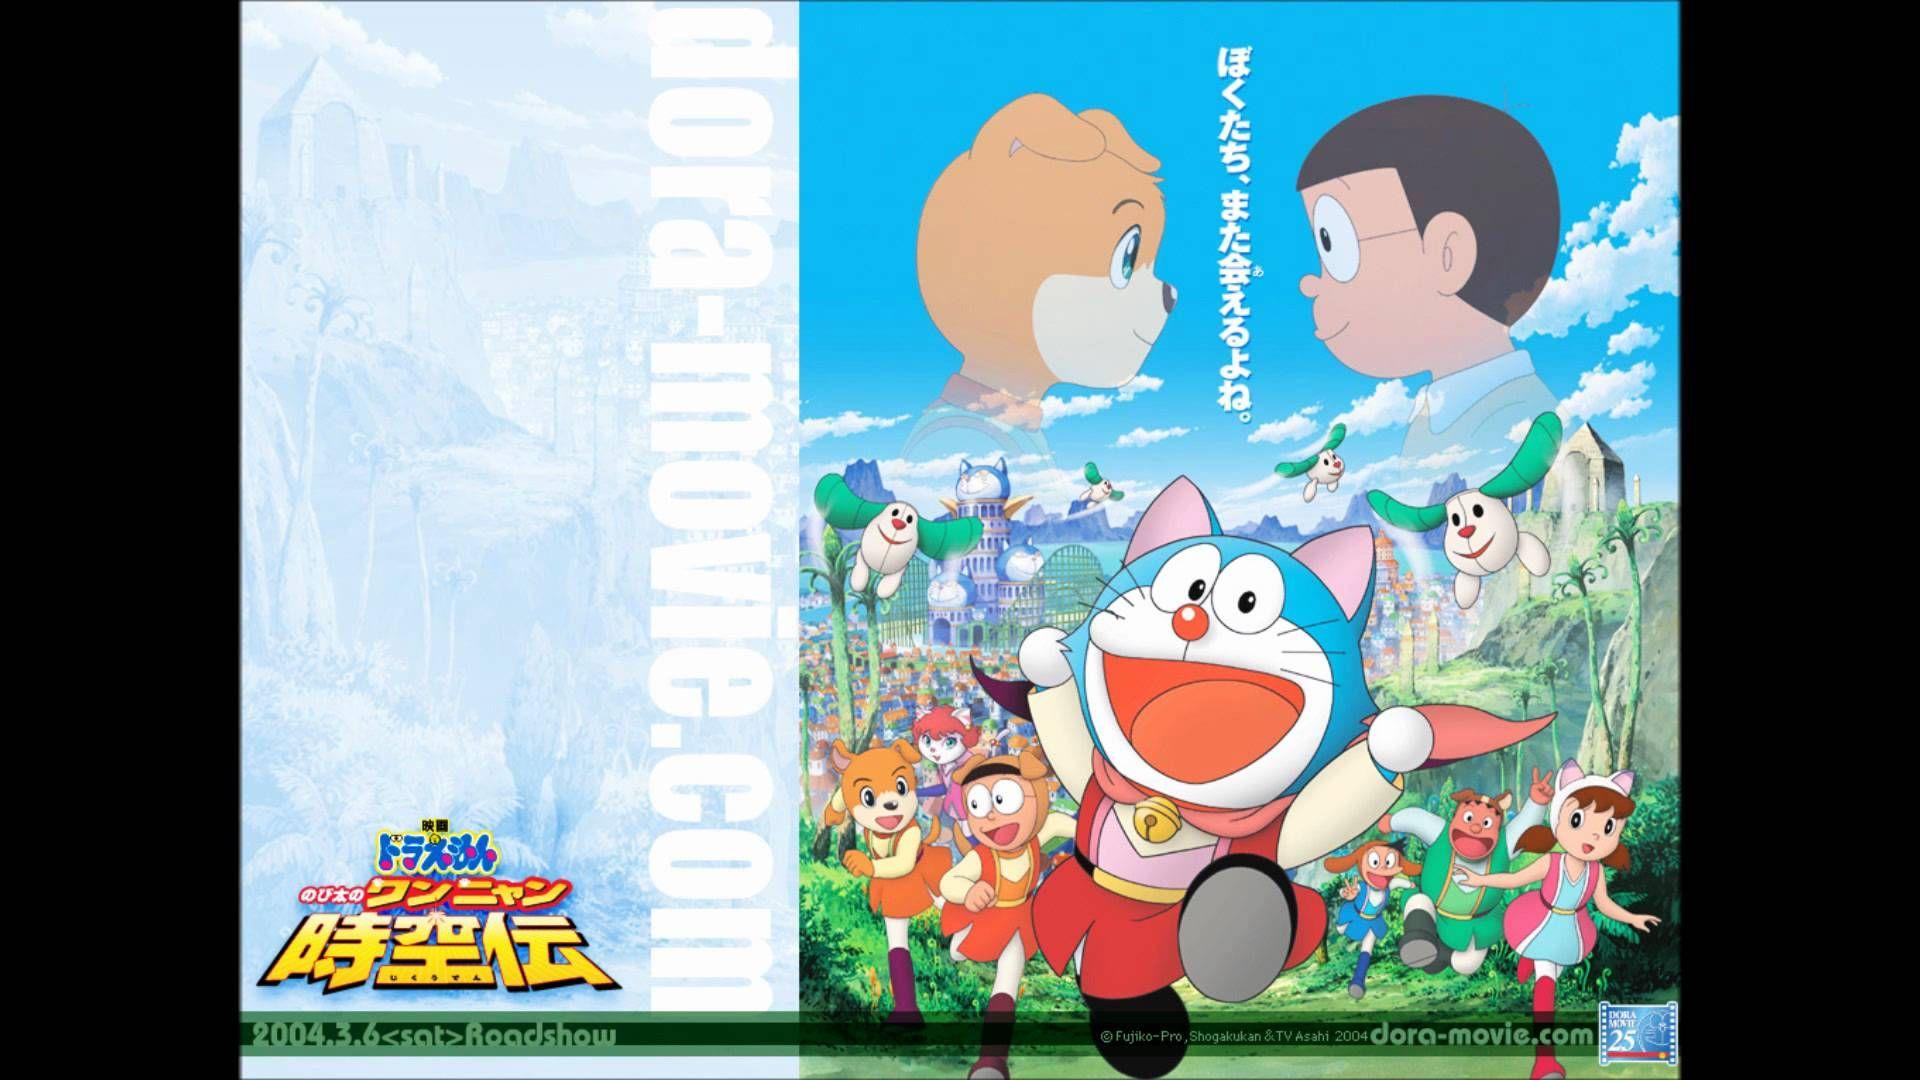 doraemon nobita s wannyan space time odyssey movie ed yume biyori male version doraemon space time children s books